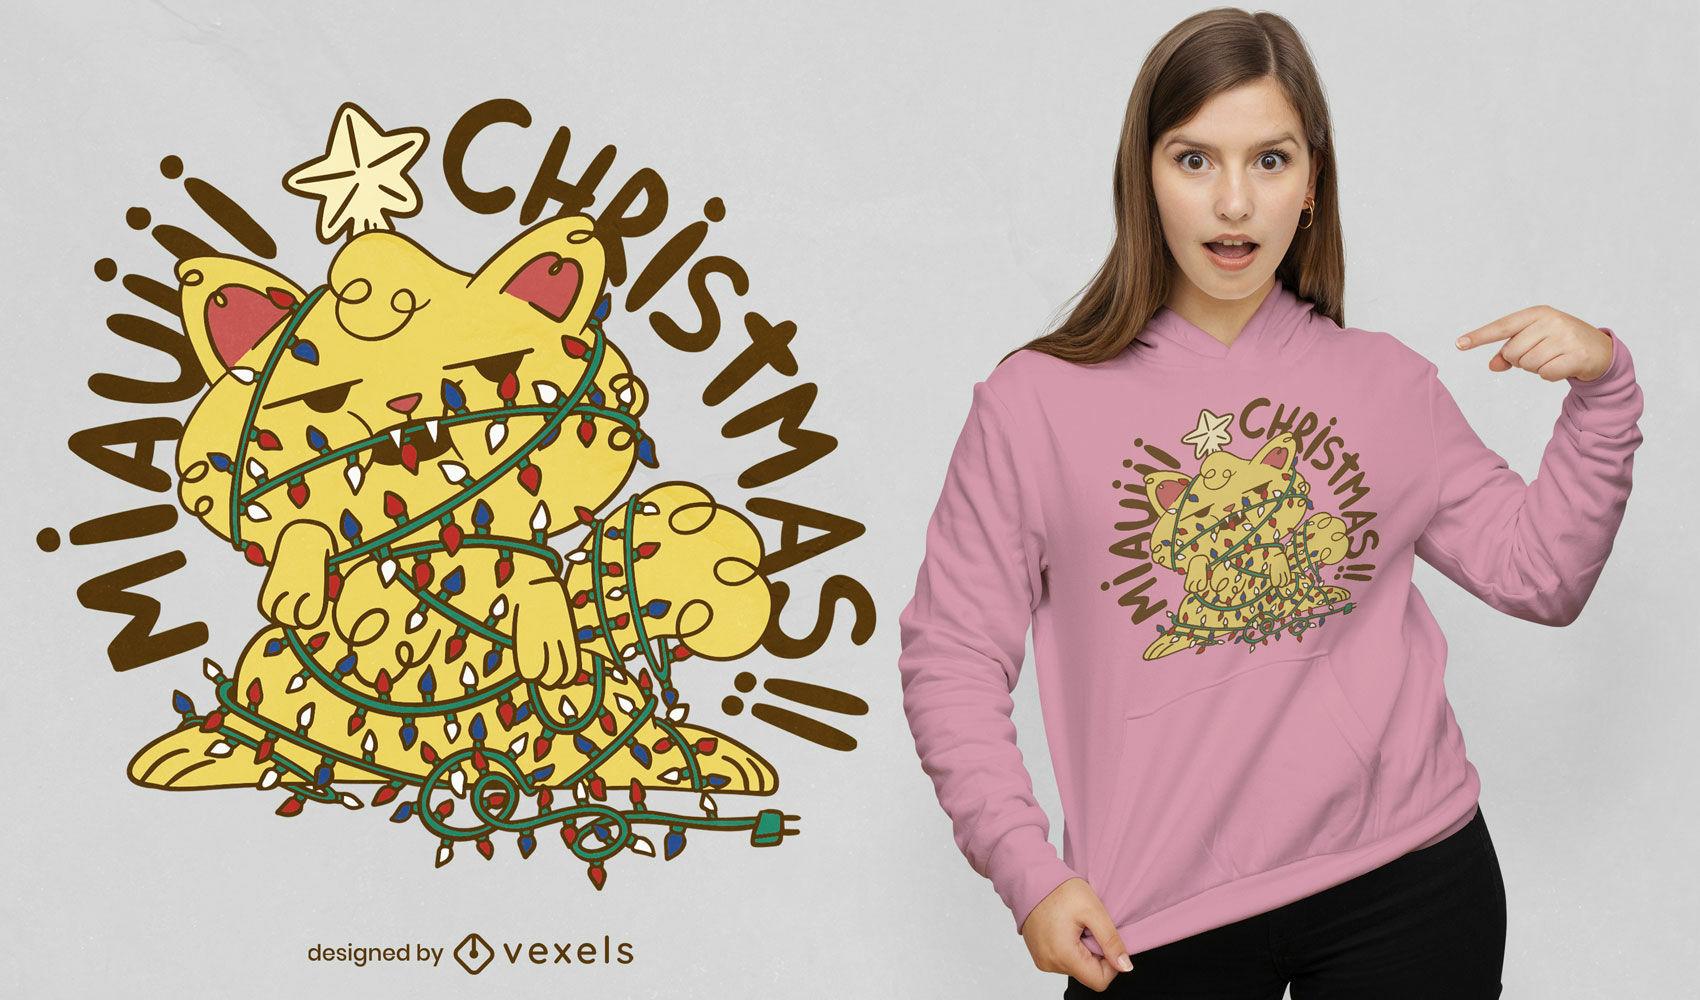 Gato en dise?o de camiseta de luces de ?rbol de navidad